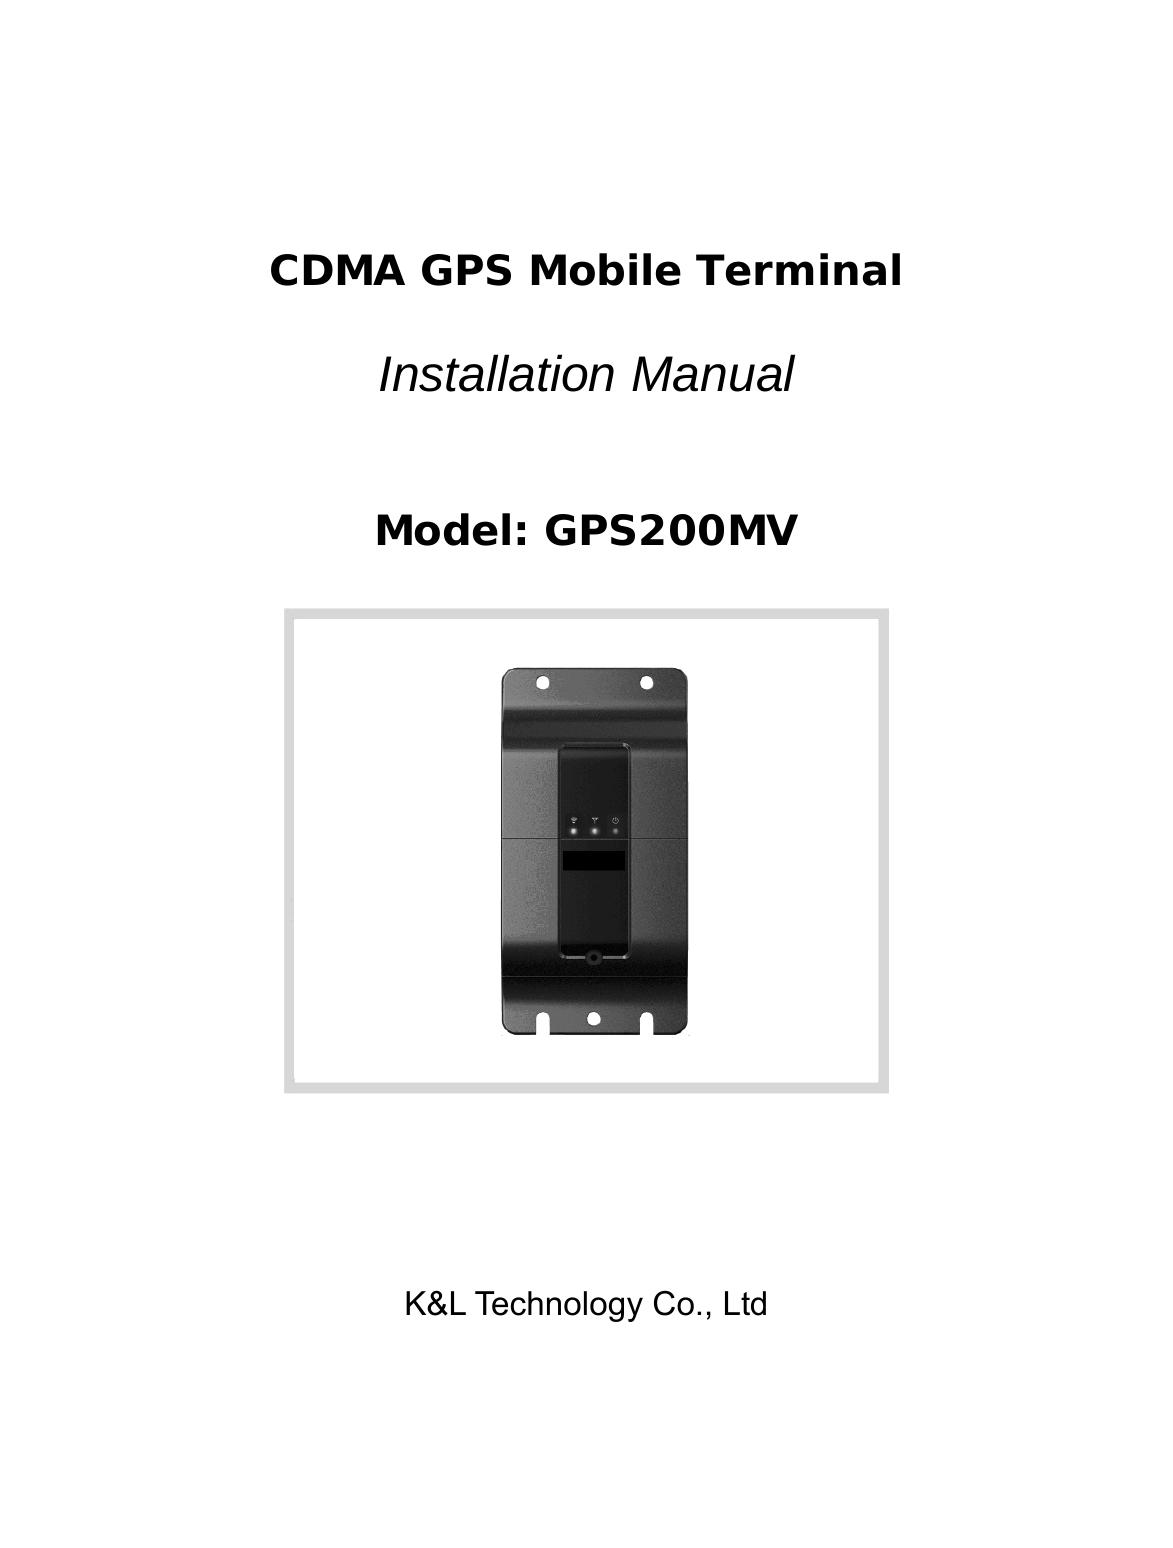 joa telecom gps200mv cdma gps mobile terminal user manual enter text rh usermanual wiki Garmin GPS Guide Garmin GPS Guide